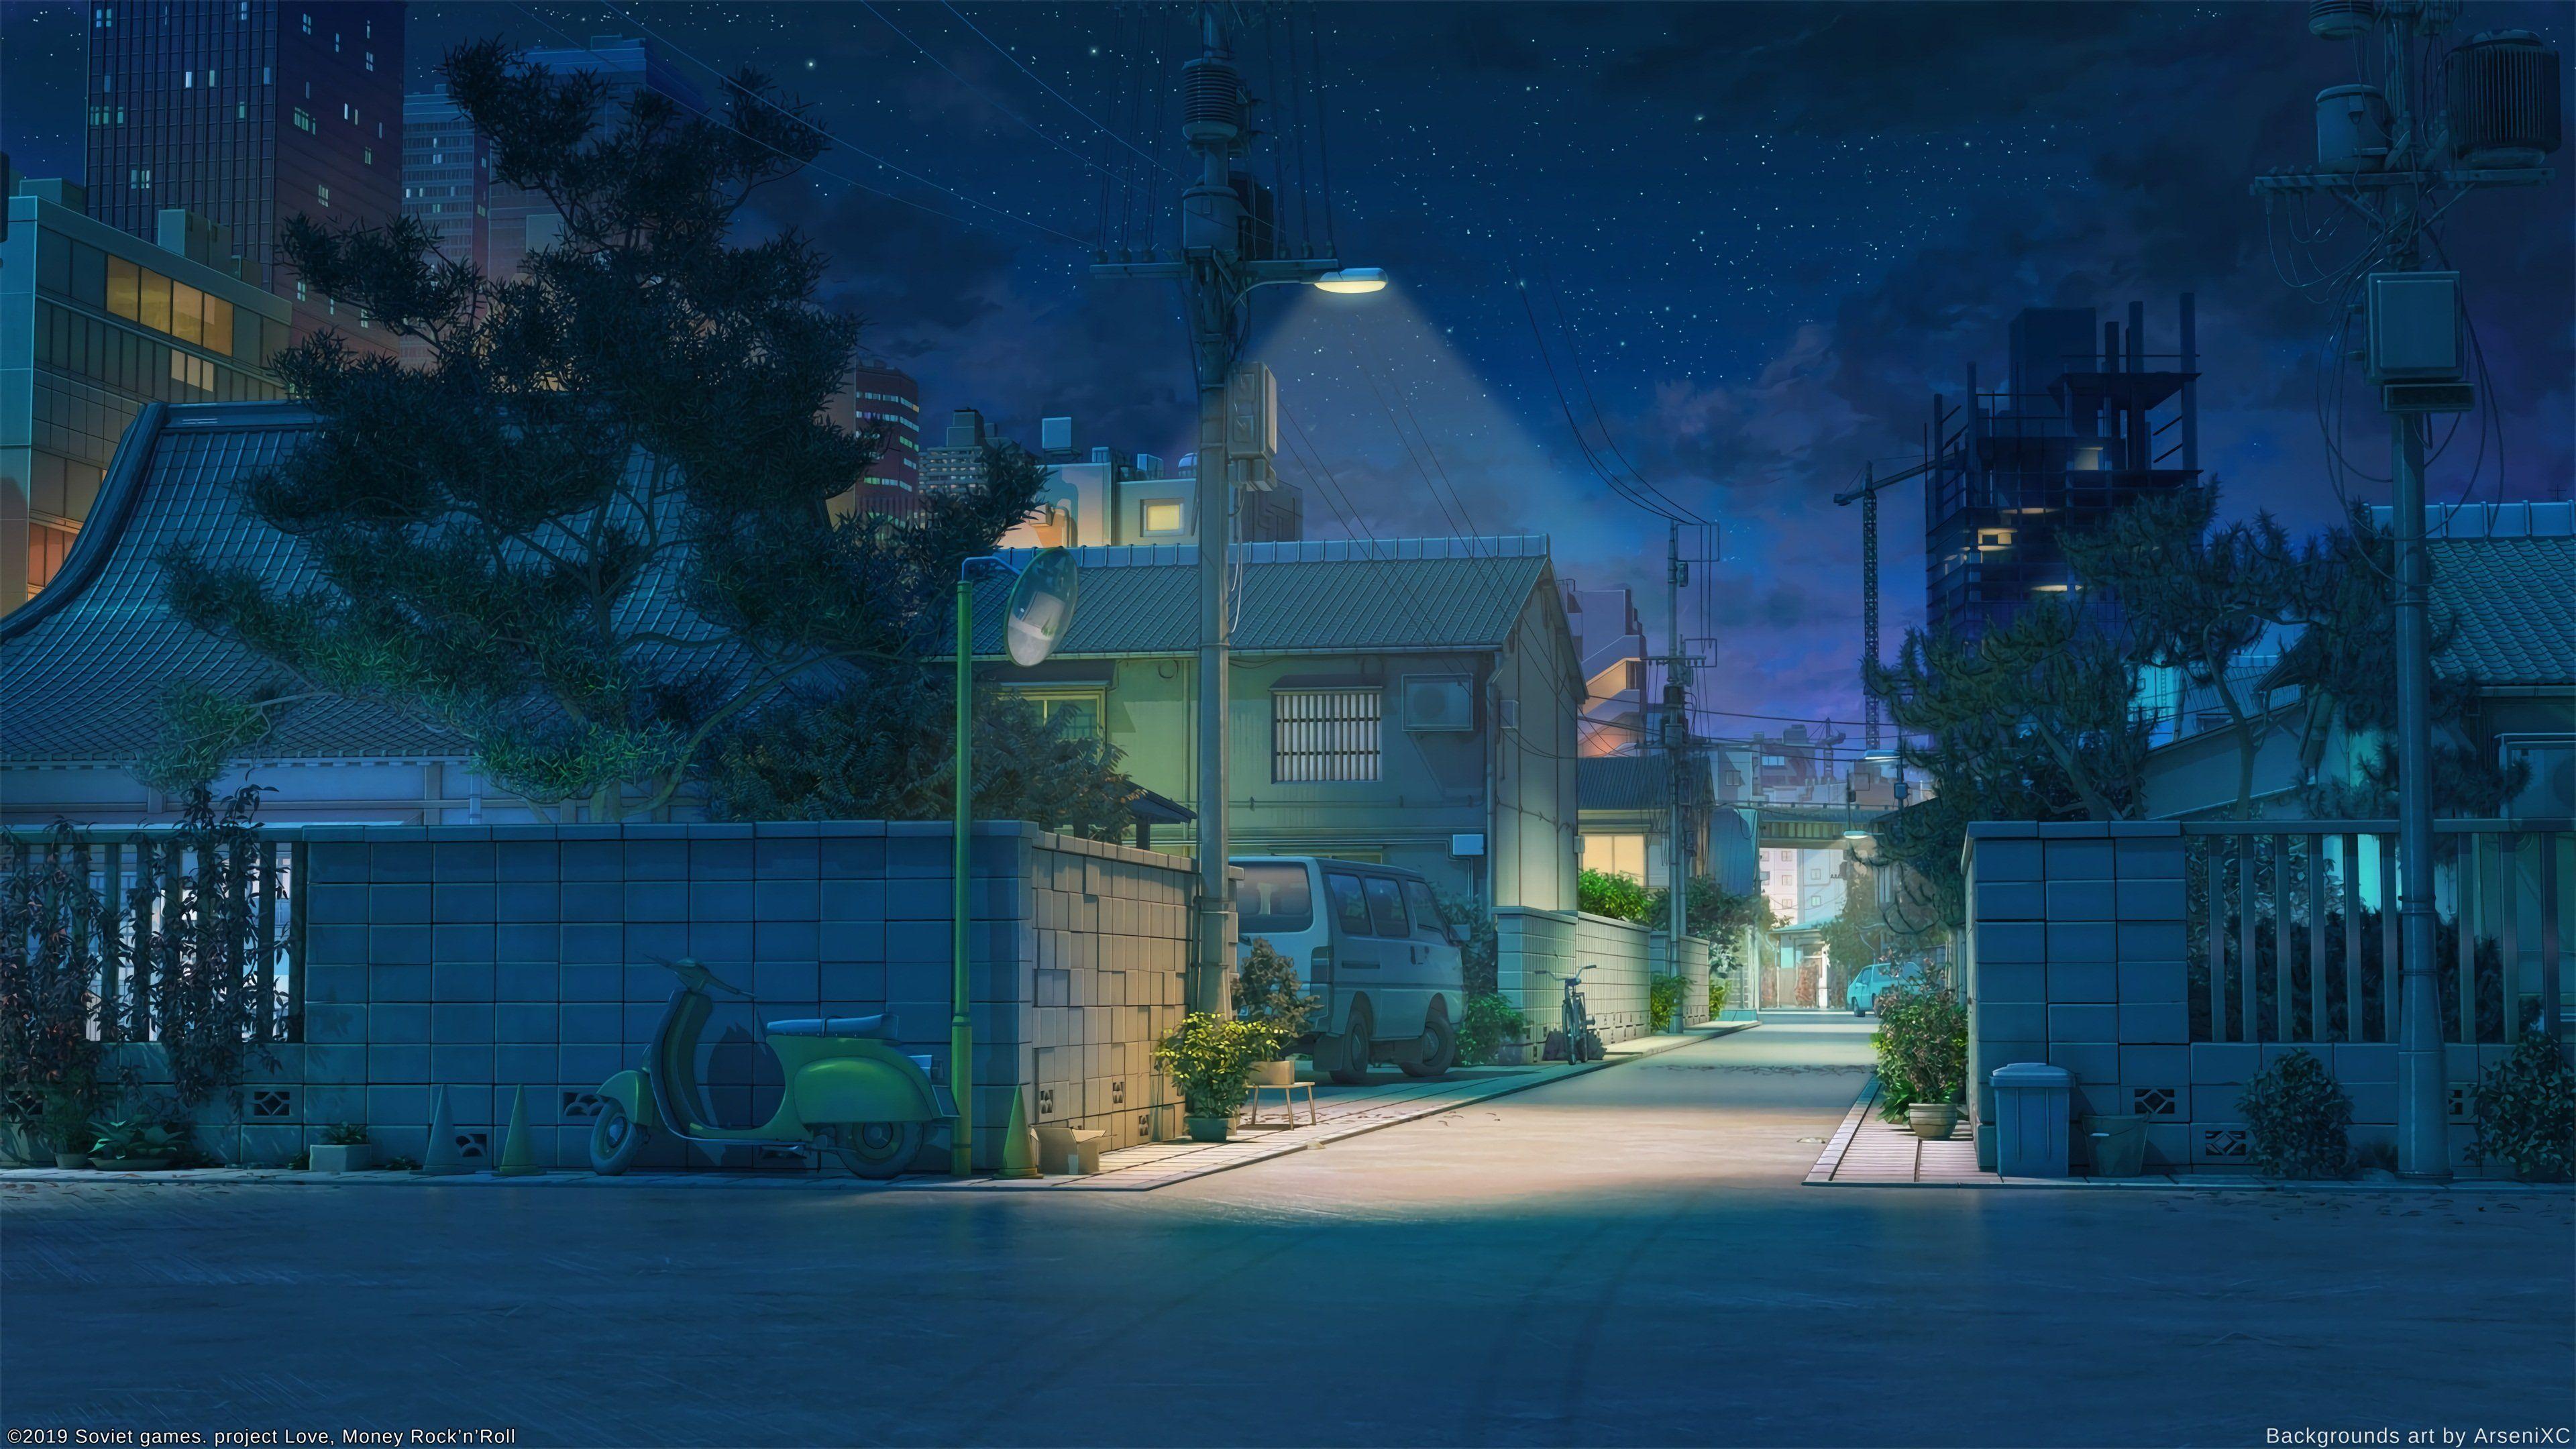 Anime Street Wallpapers - Top Free Anime Street ...